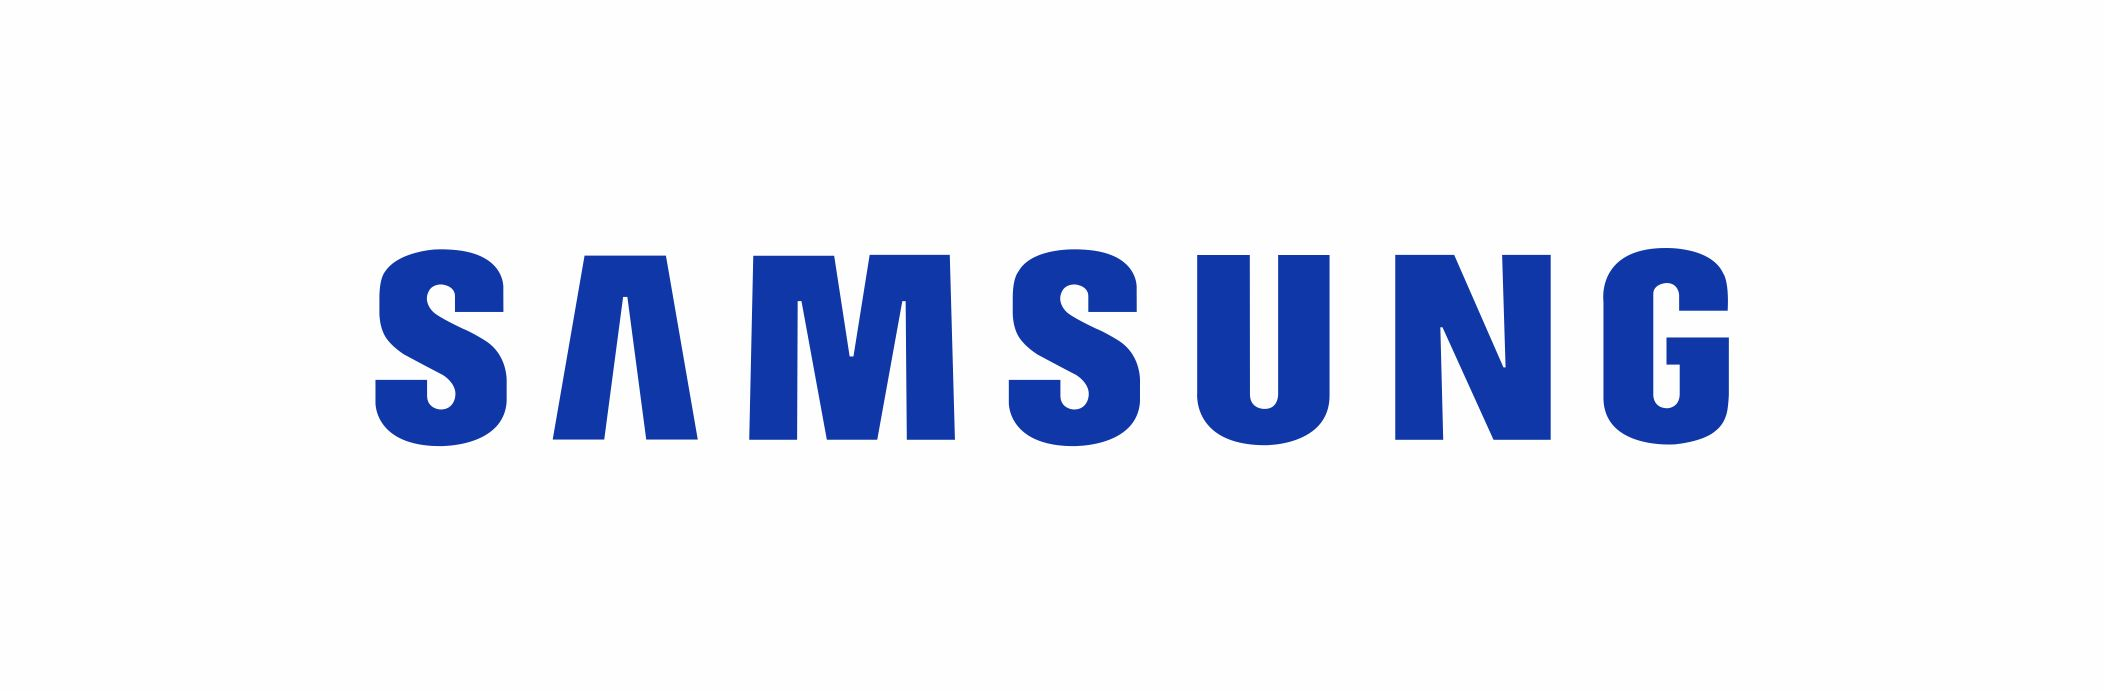 Samsung 46 milioni